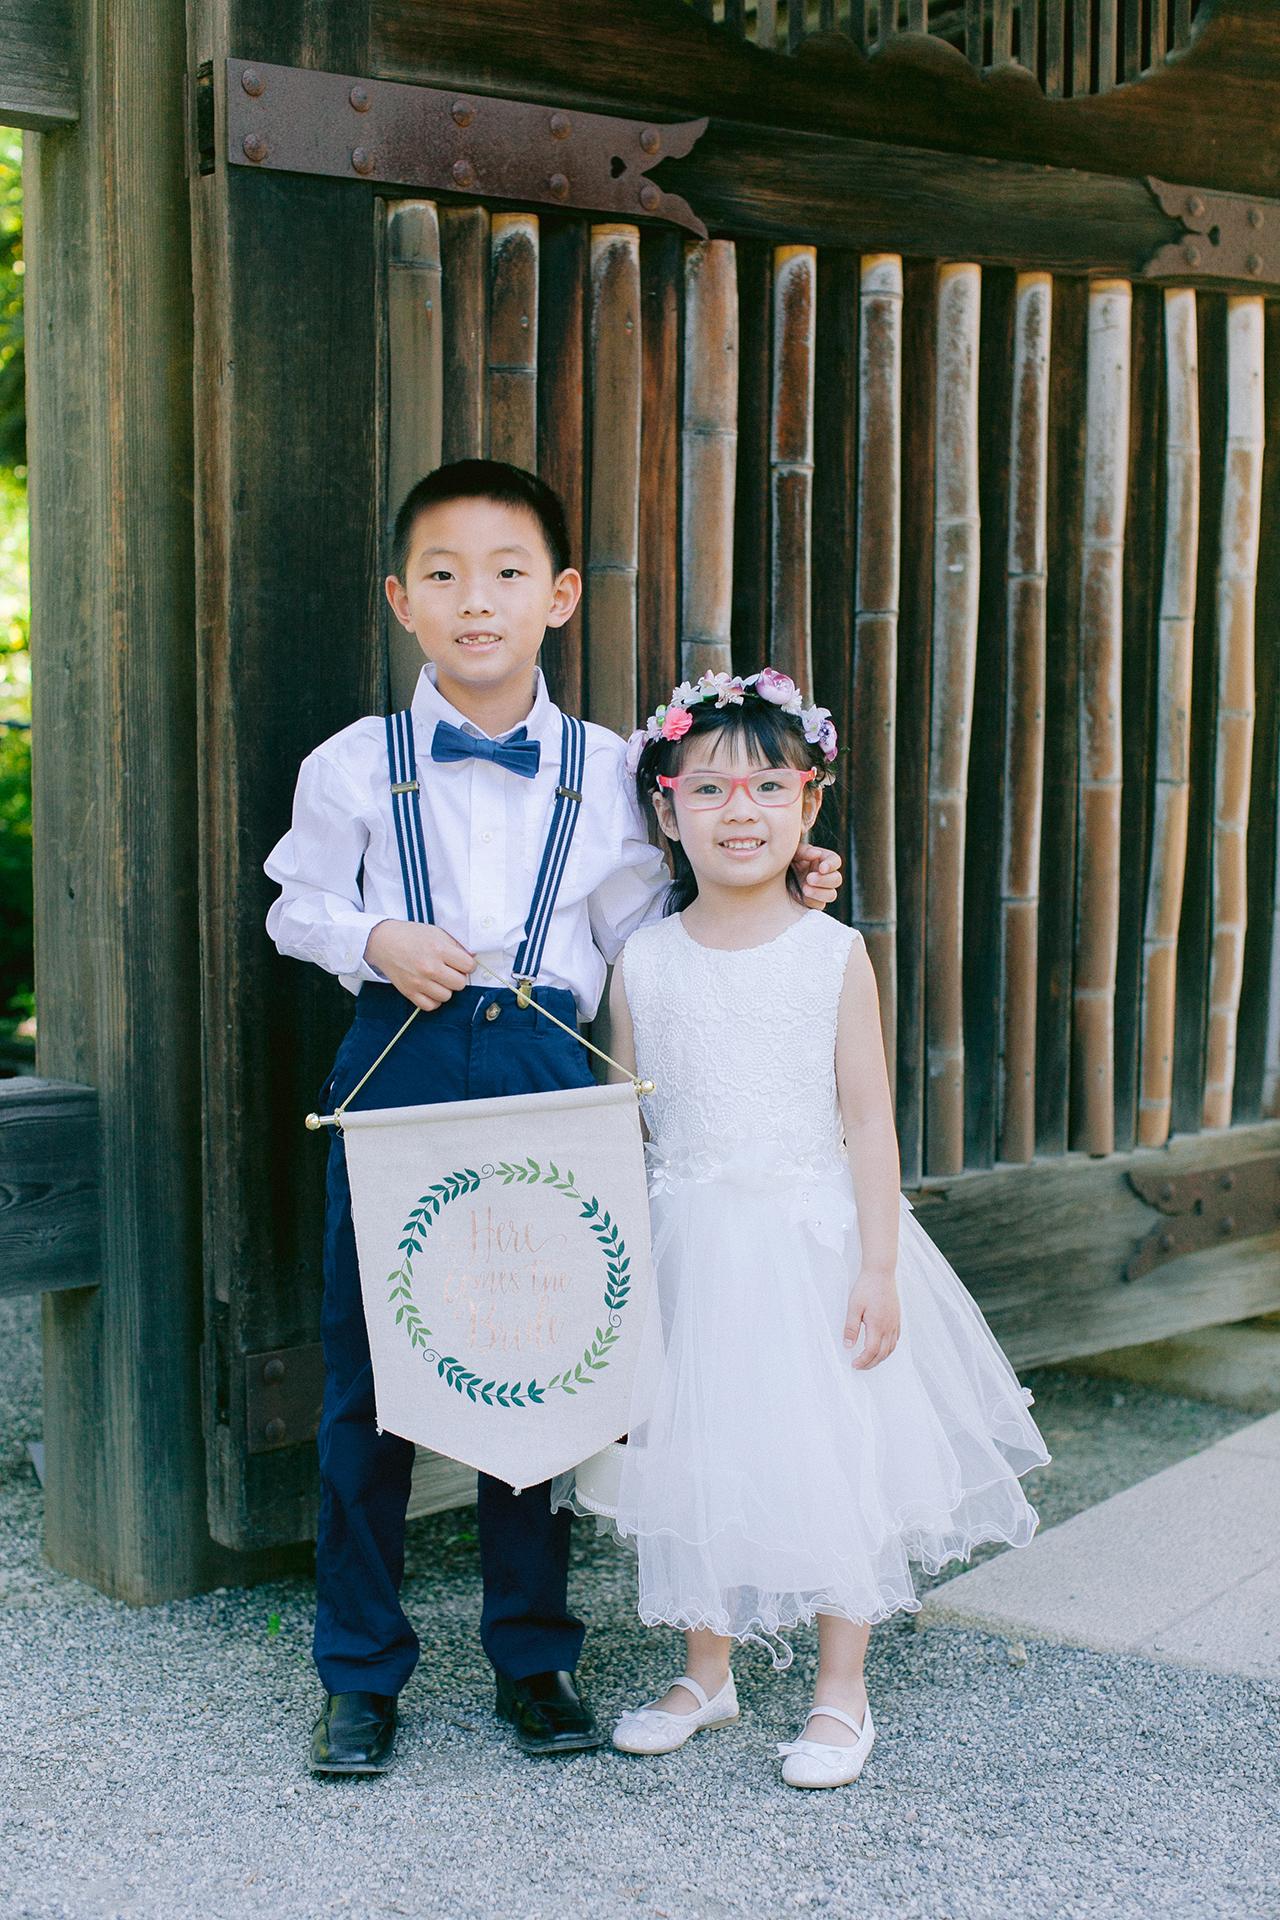 Hakone_Estate_and_Gardens_Wedding_018.jpg